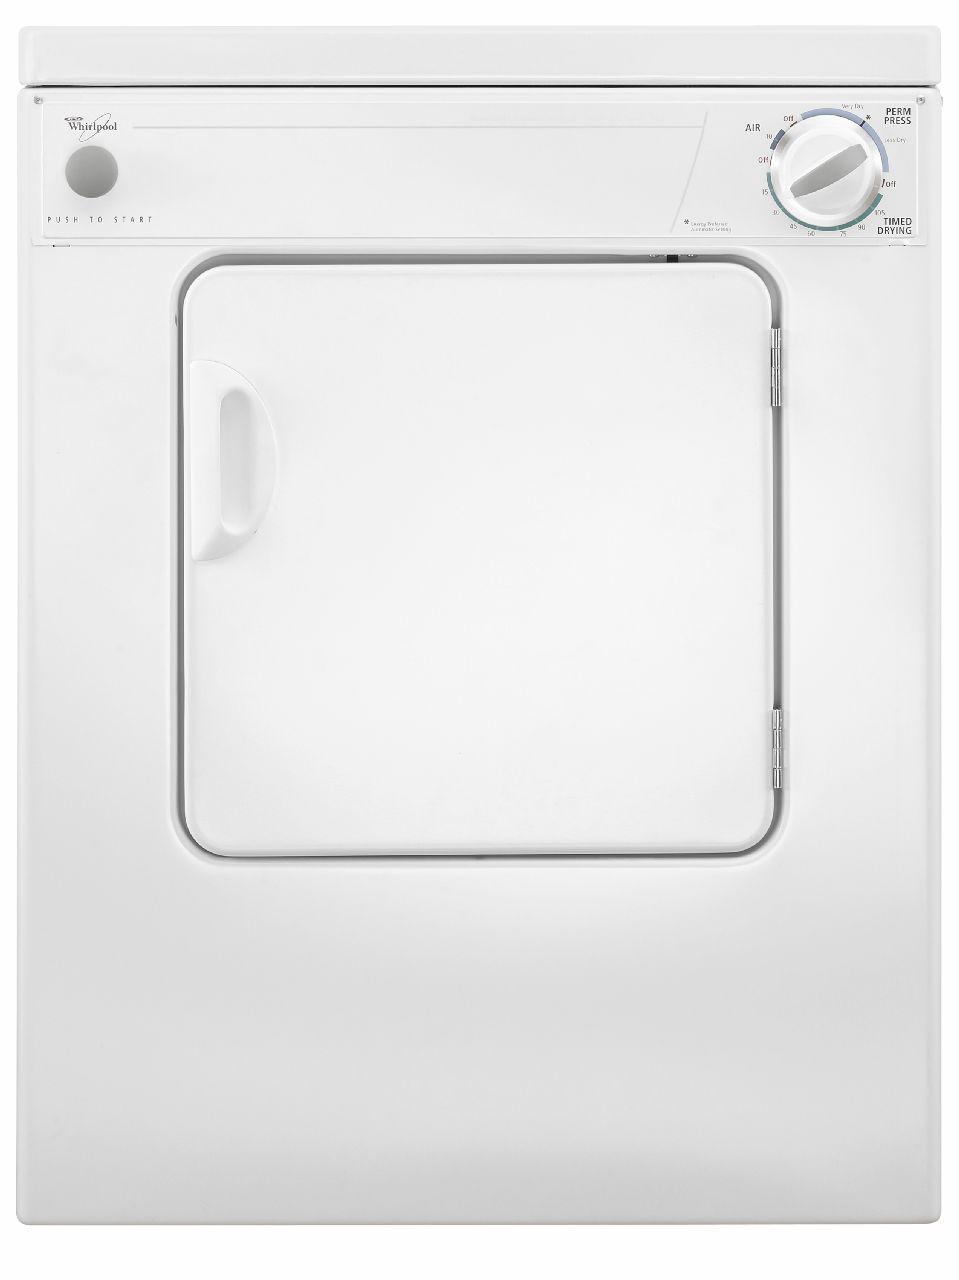 Whirlpool Dryer Model Ldr3822pq1 Parts Amp Repair Help